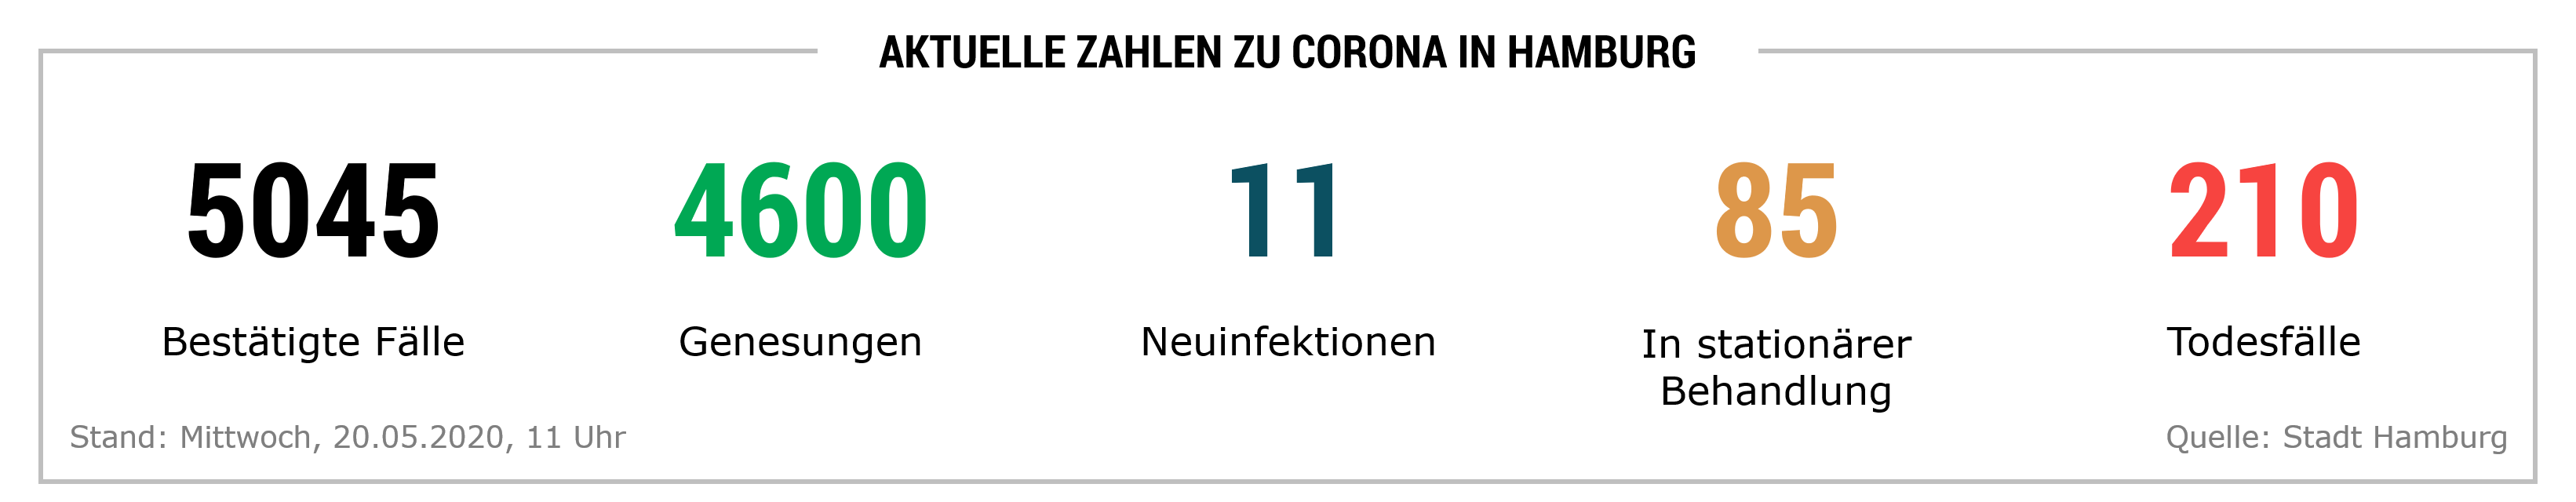 Corona Zahlen Hamburg